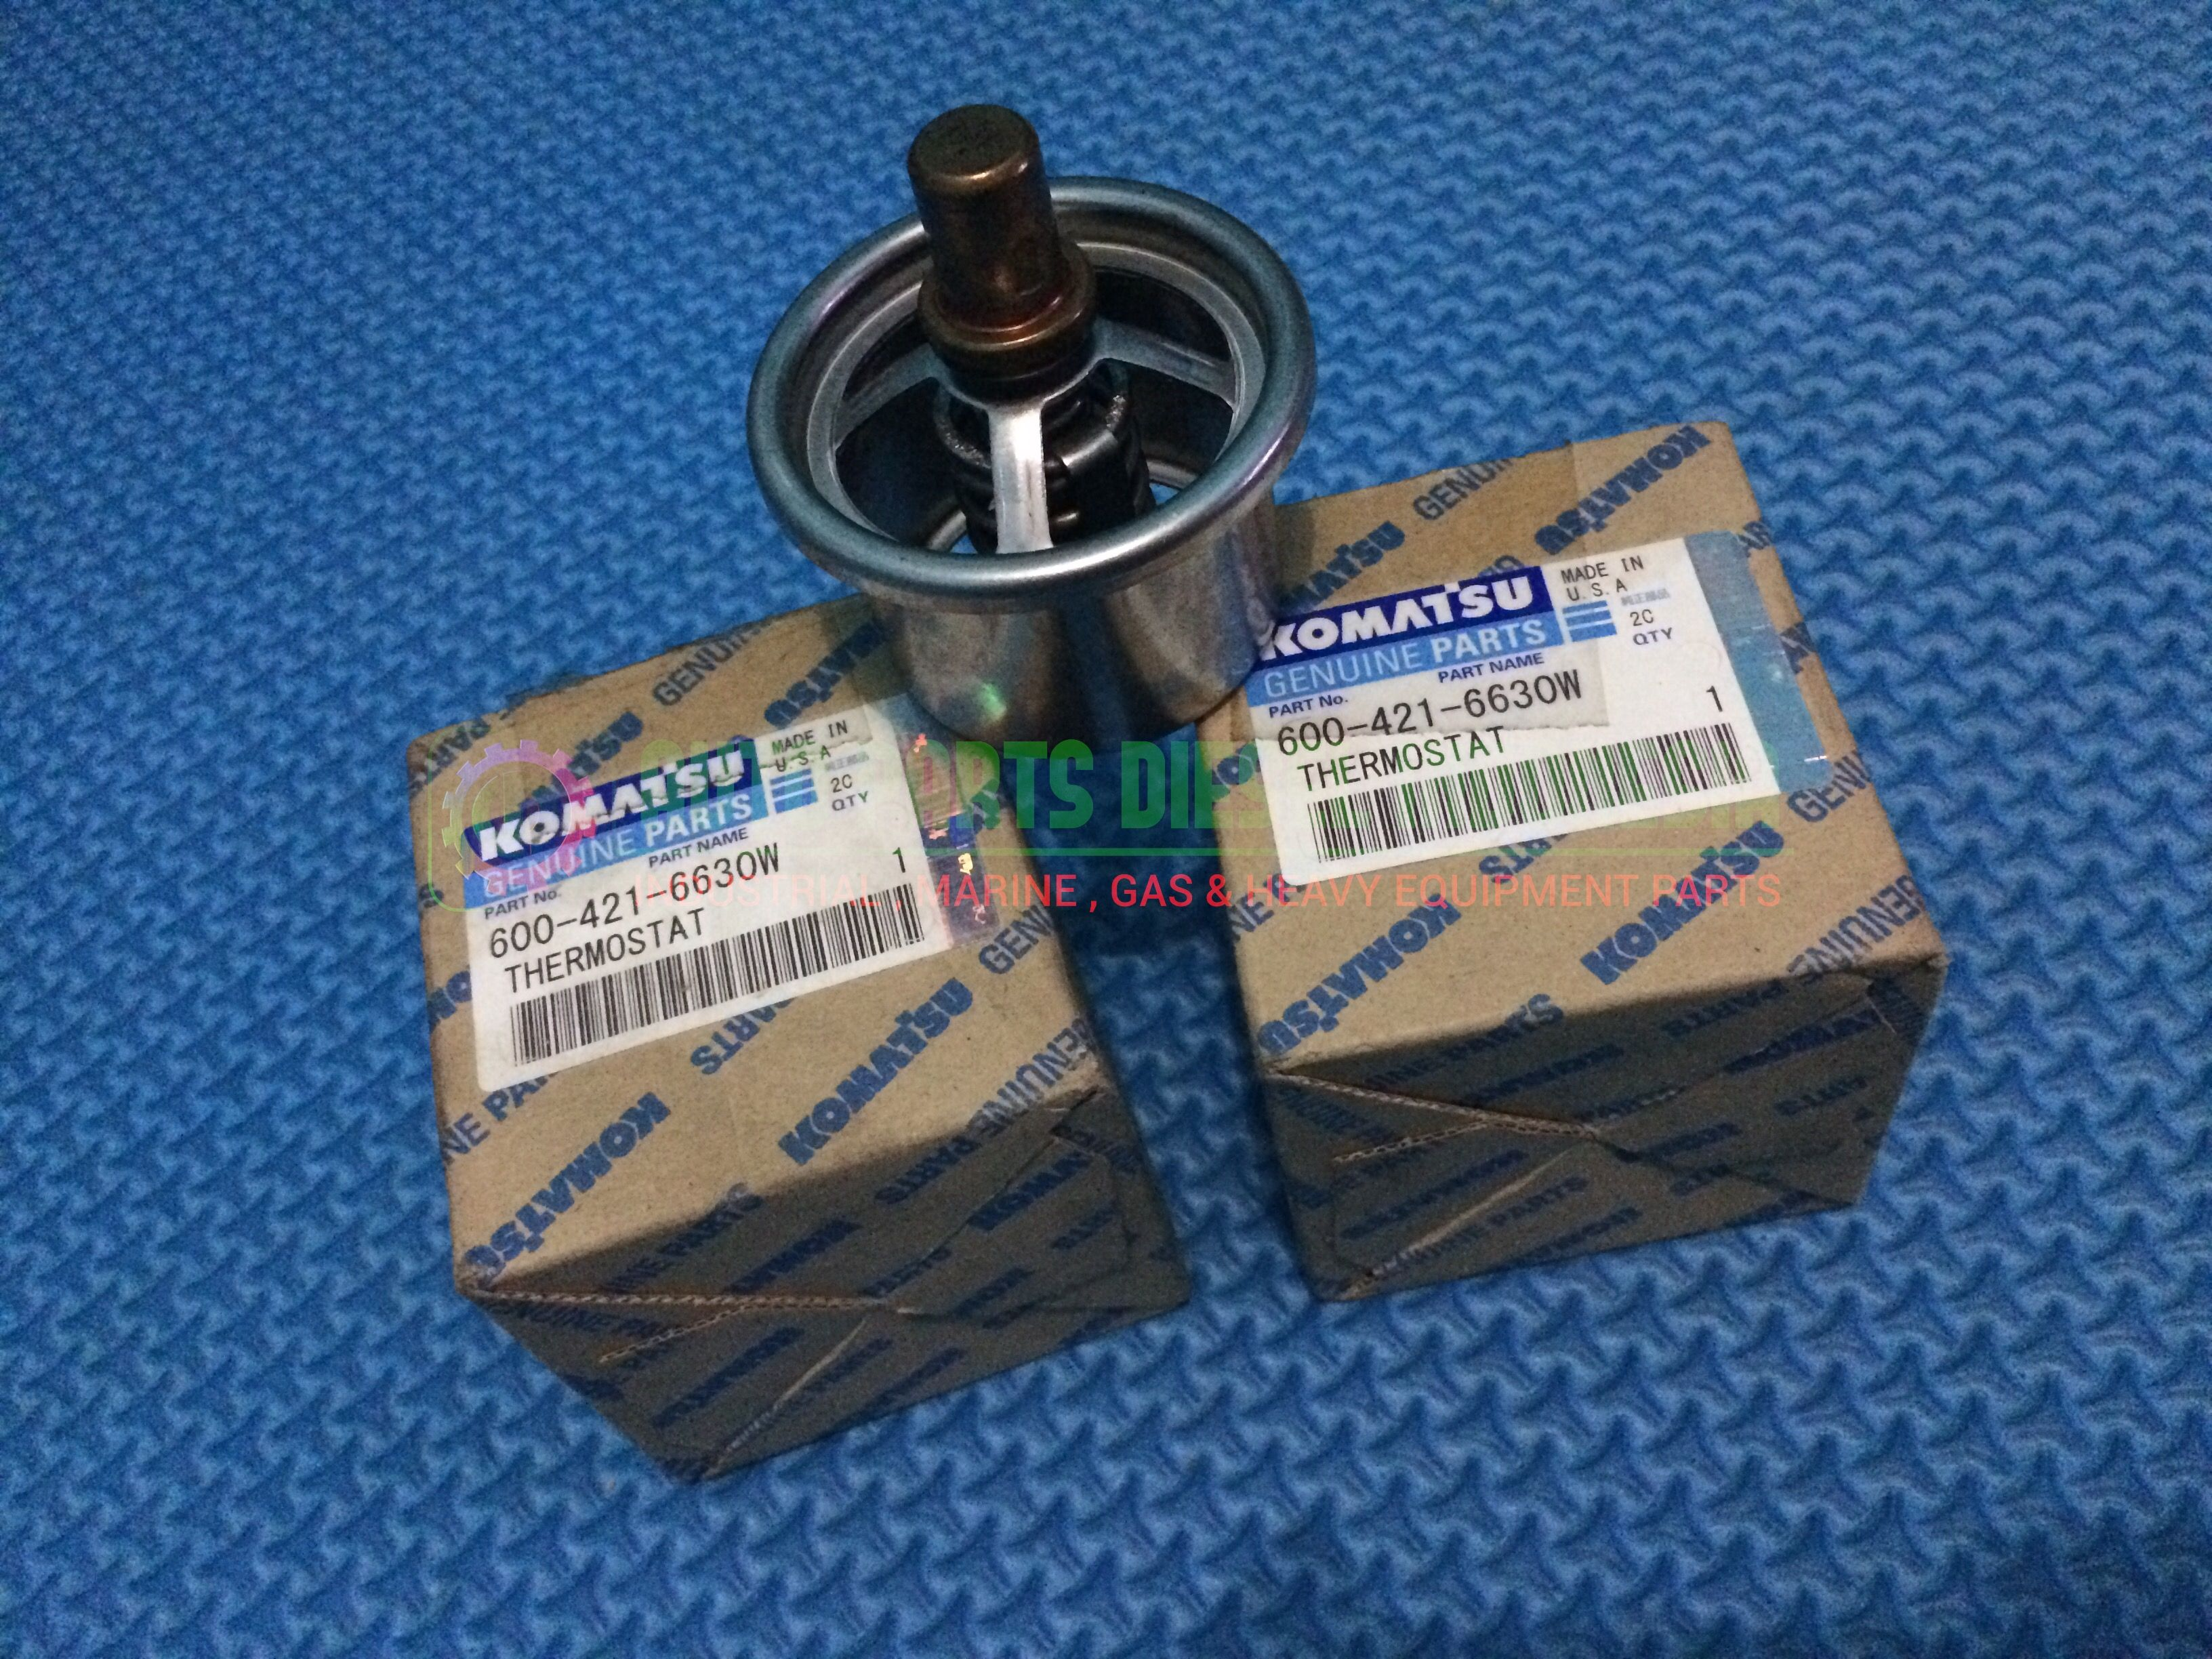 Thermostat 600-421-6630W Komatsu Genset Engine SAA6D-140E-2 Komatsu